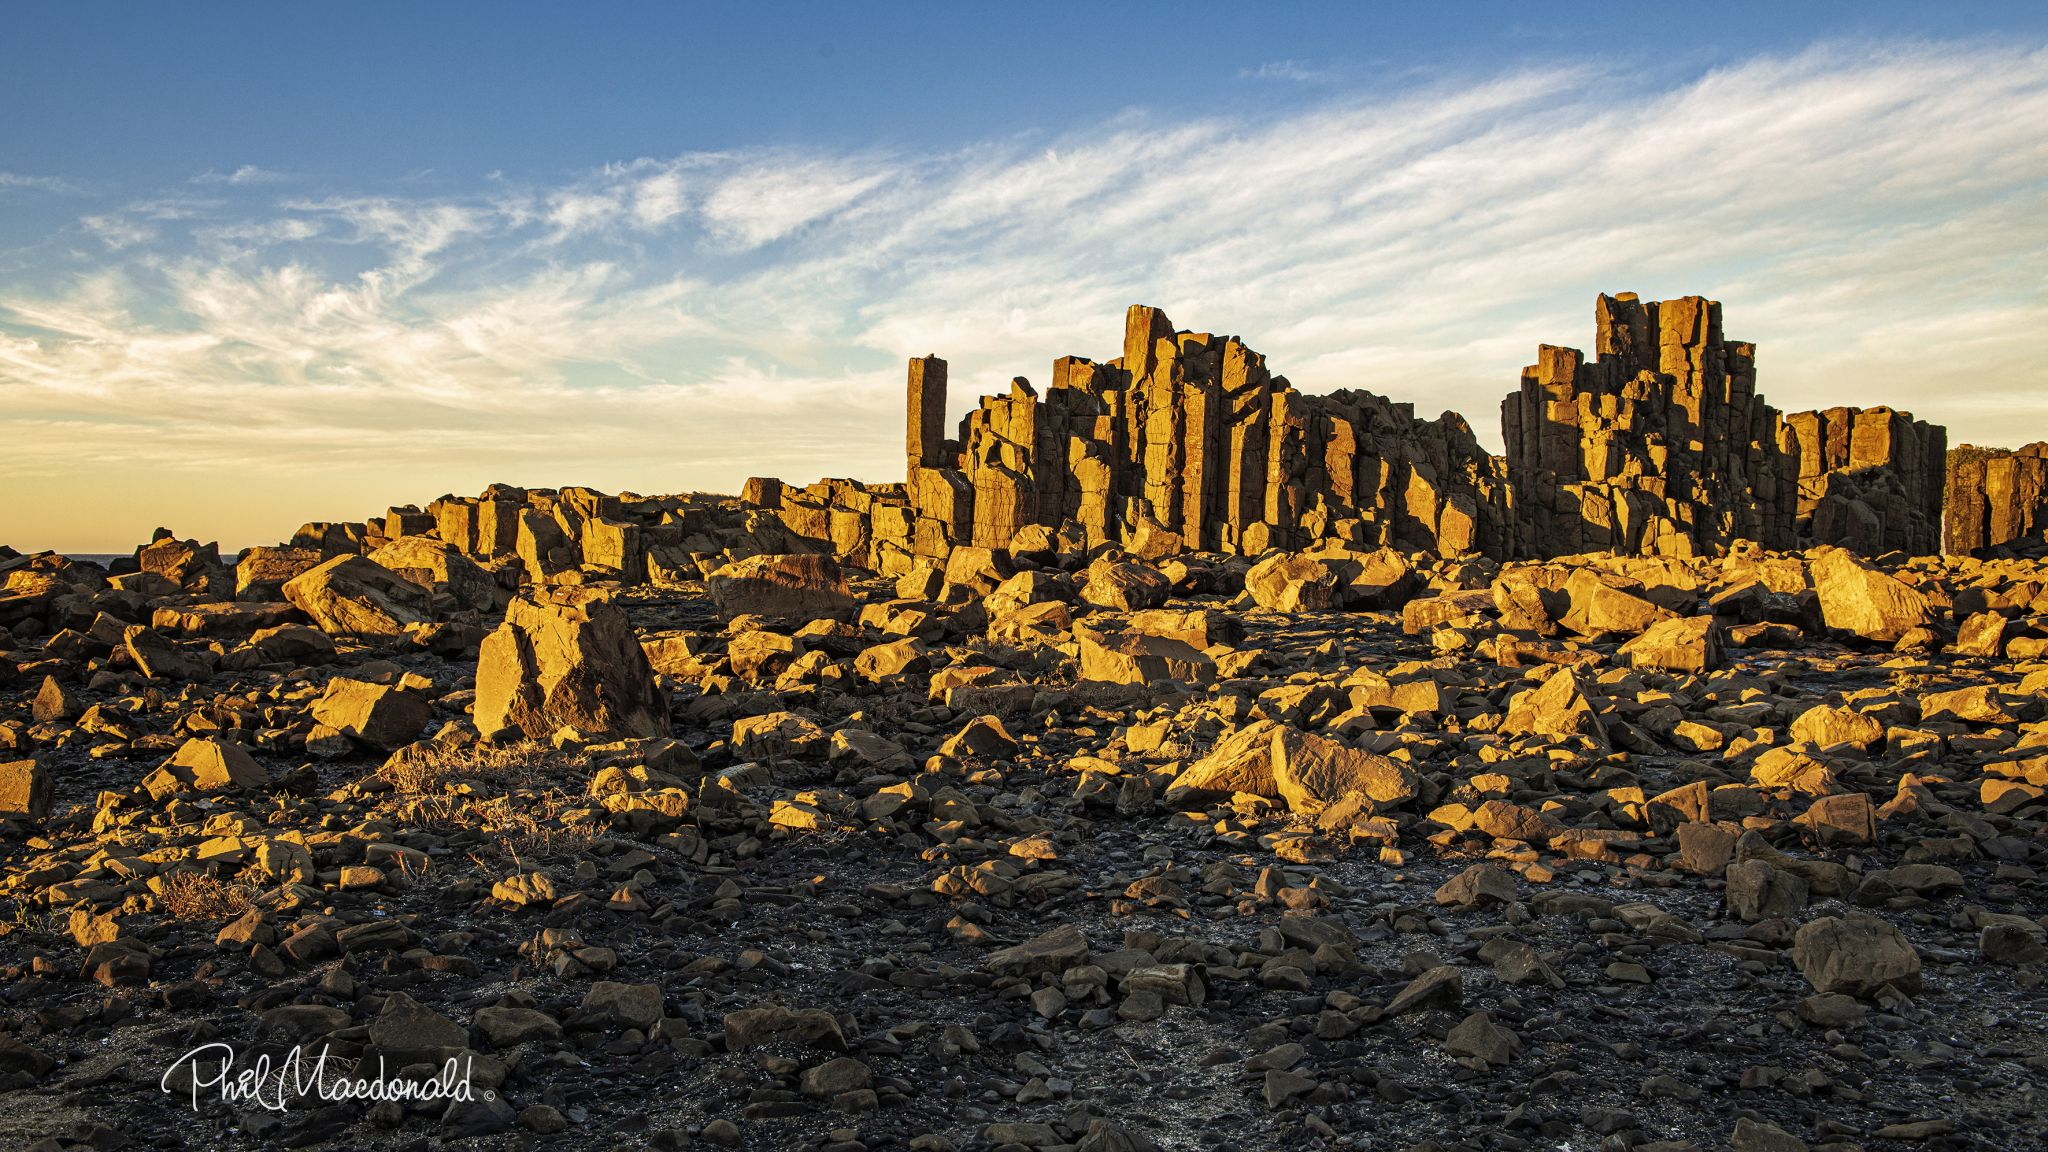 Bombo Headland Quarry, Kiama, Australia